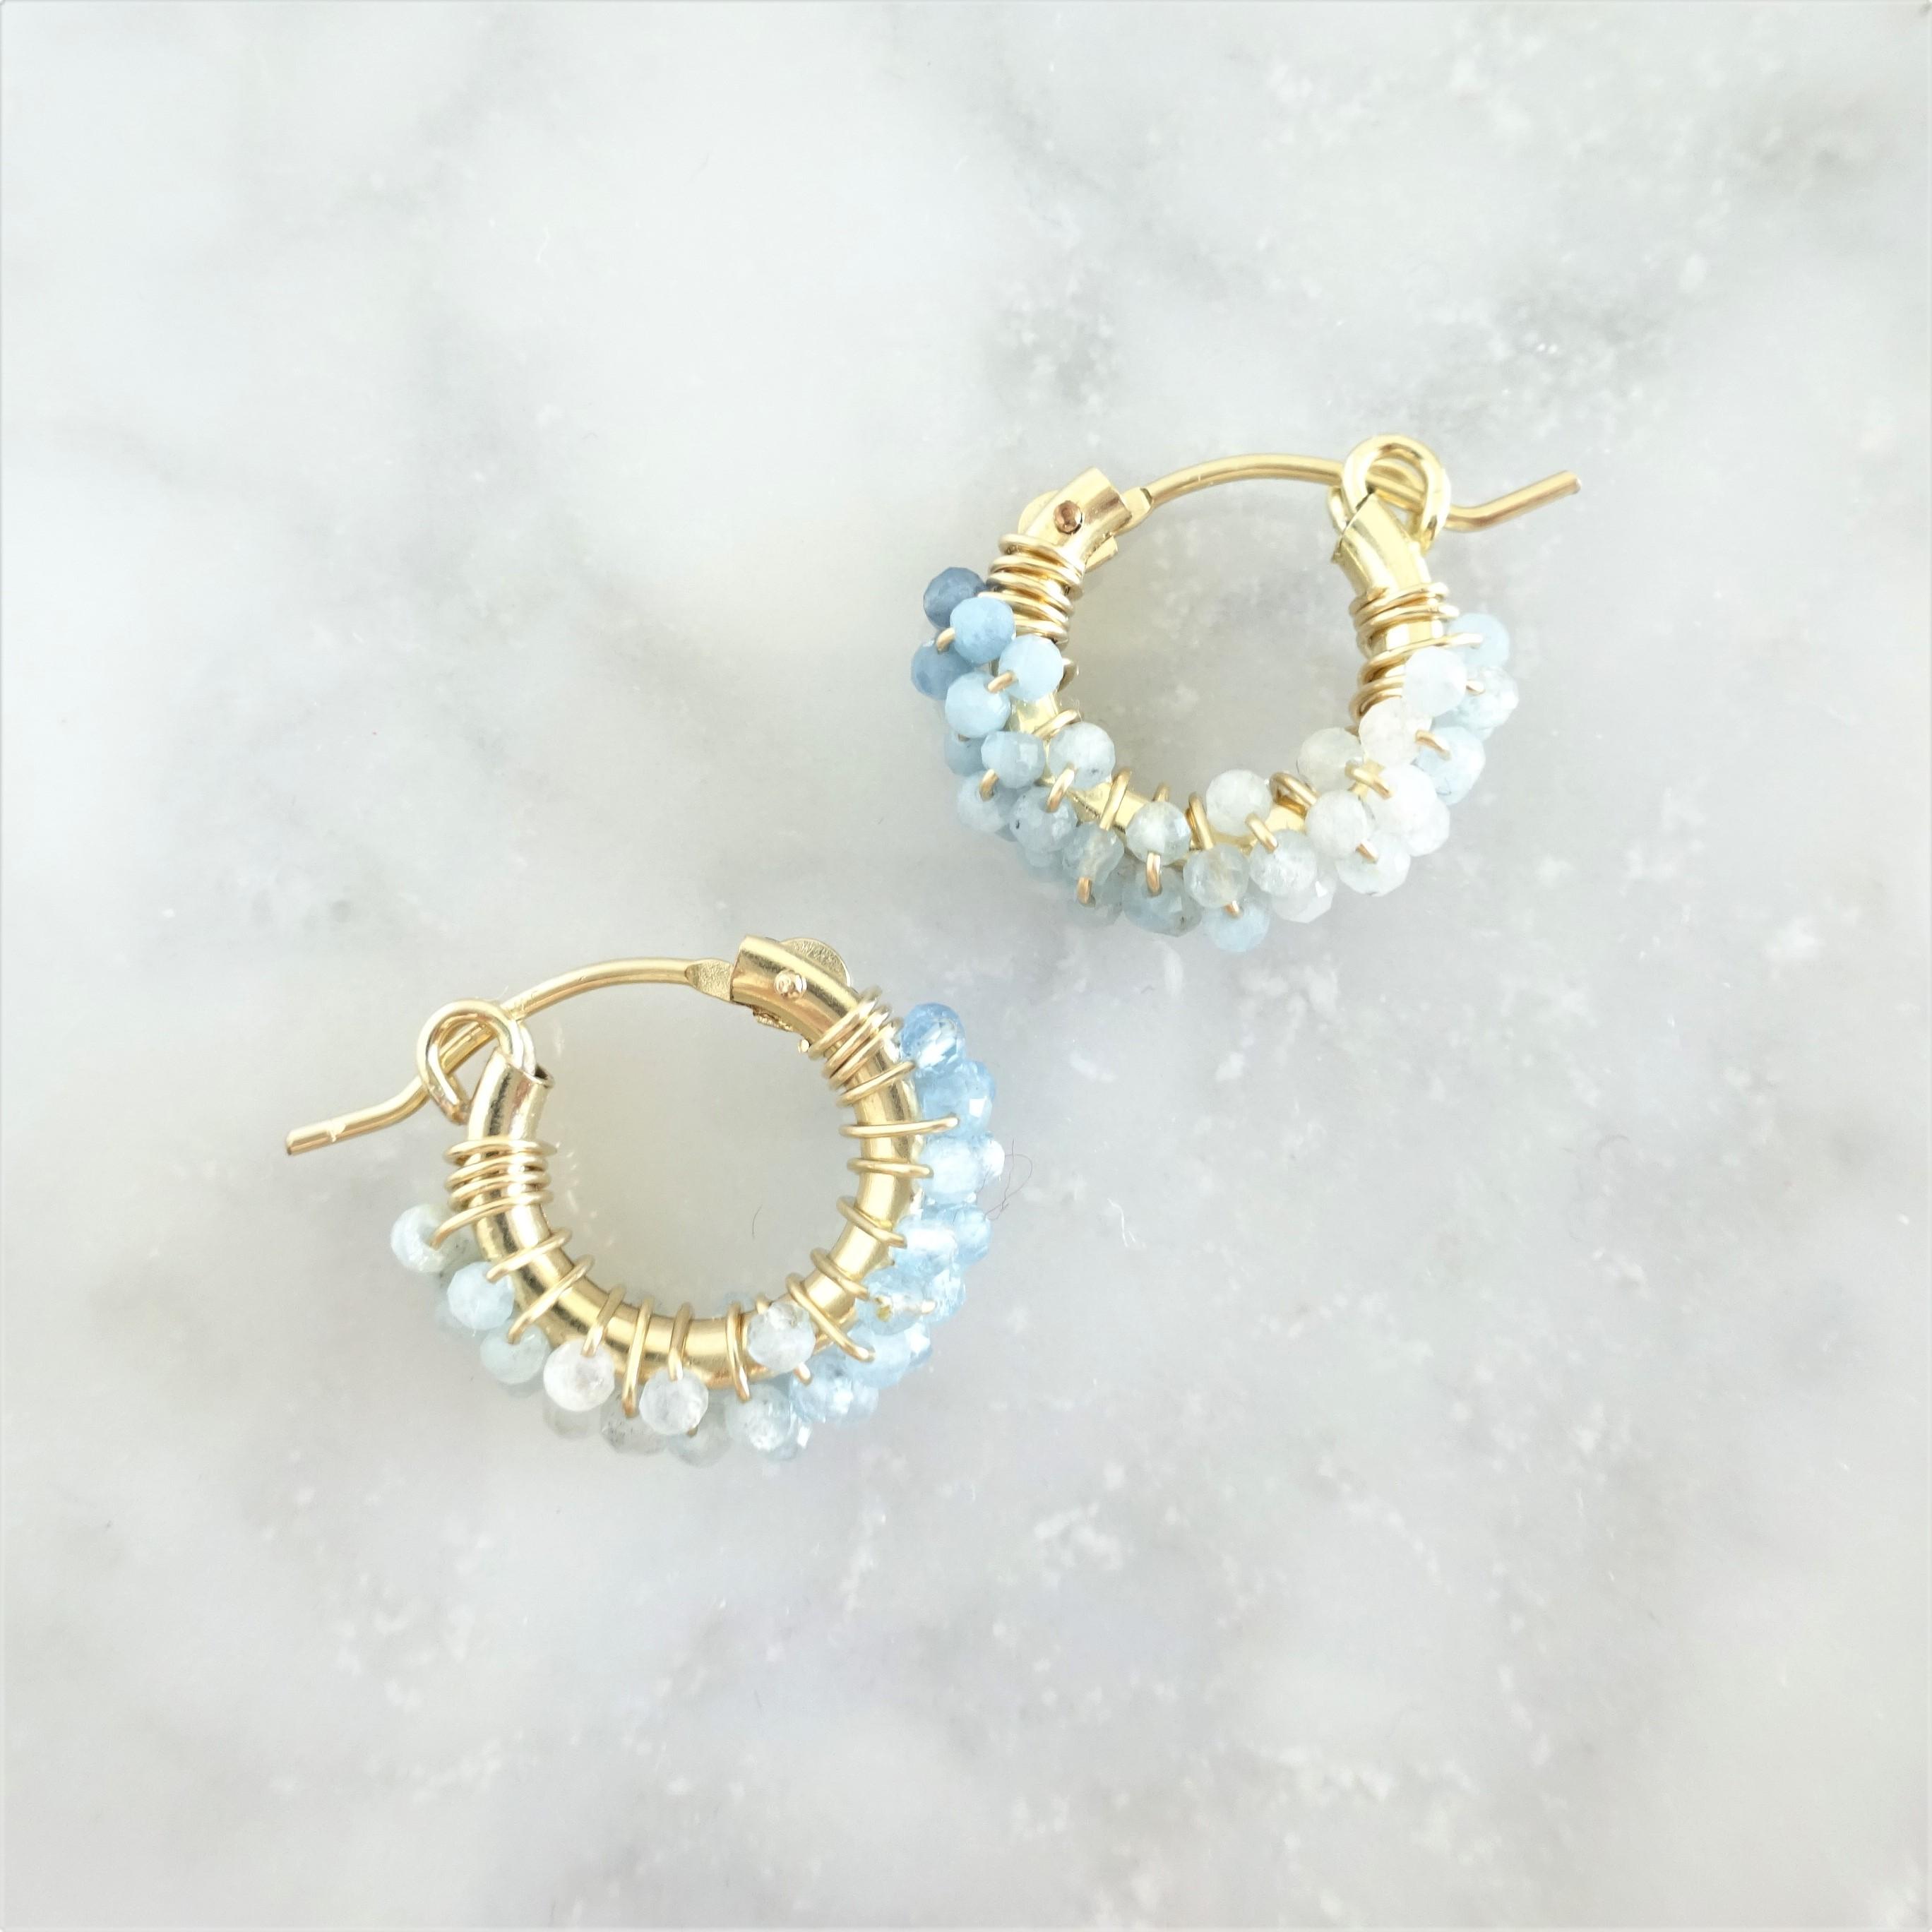 送料無料14kgf*Aquamarine pavé earring / pierced earringSS